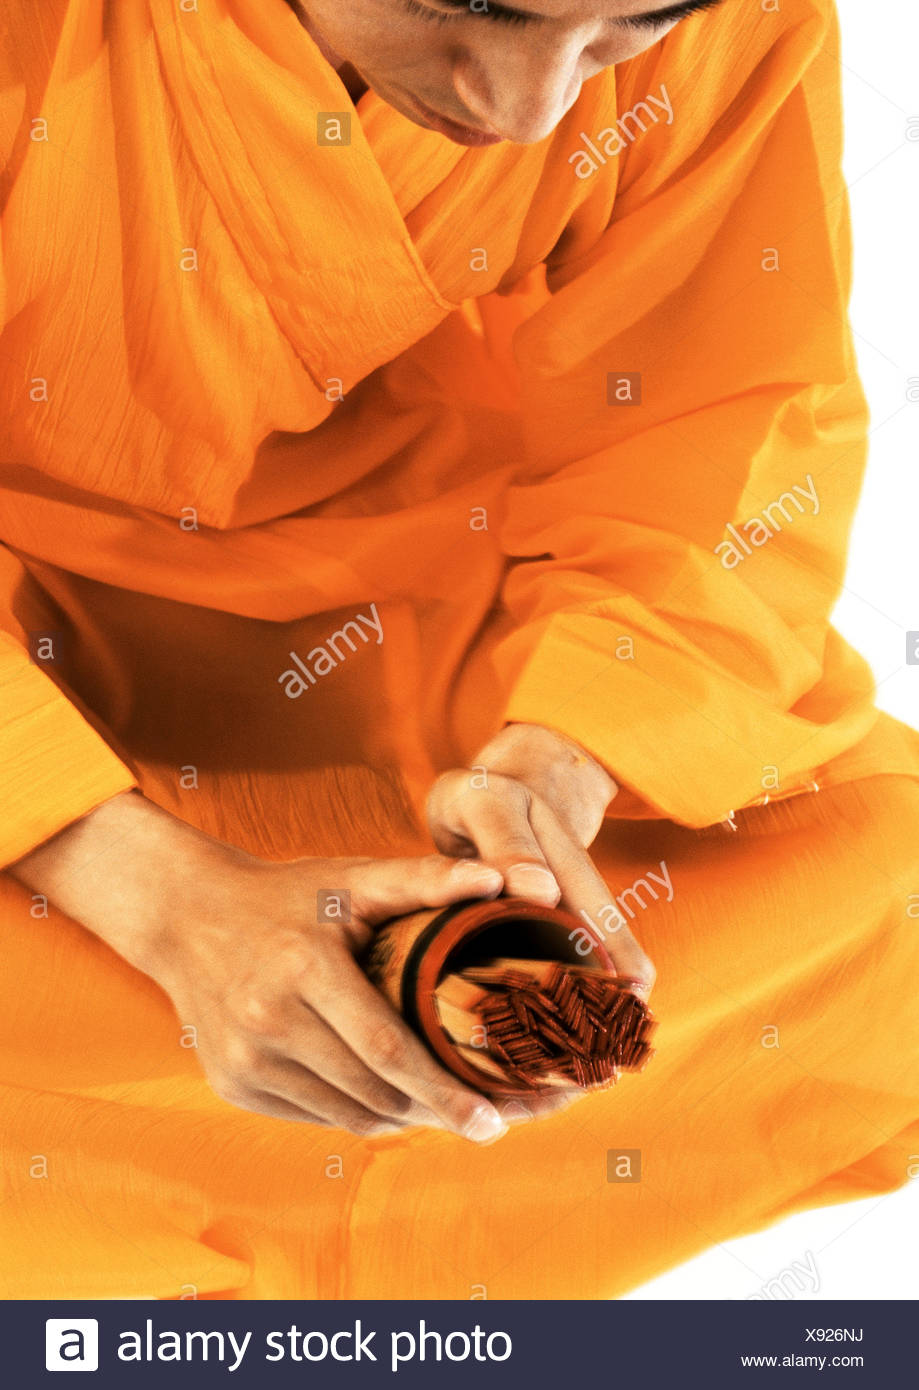 Buddhist monk meditating, holding devotional objects - Stock Image